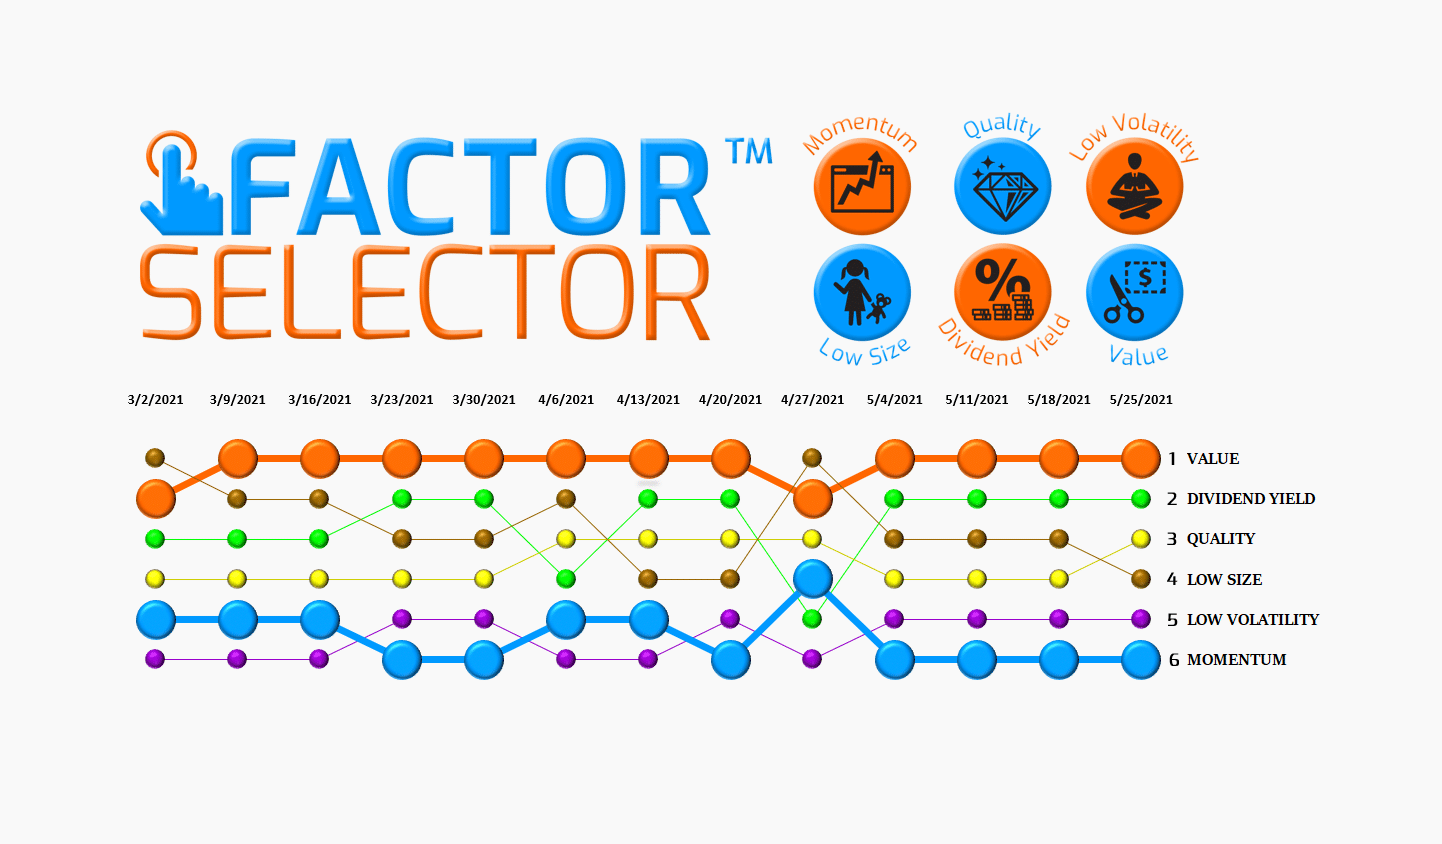 Factor Selector™  – 05/26/21 via @https://www.pinterest.com/market_scholars